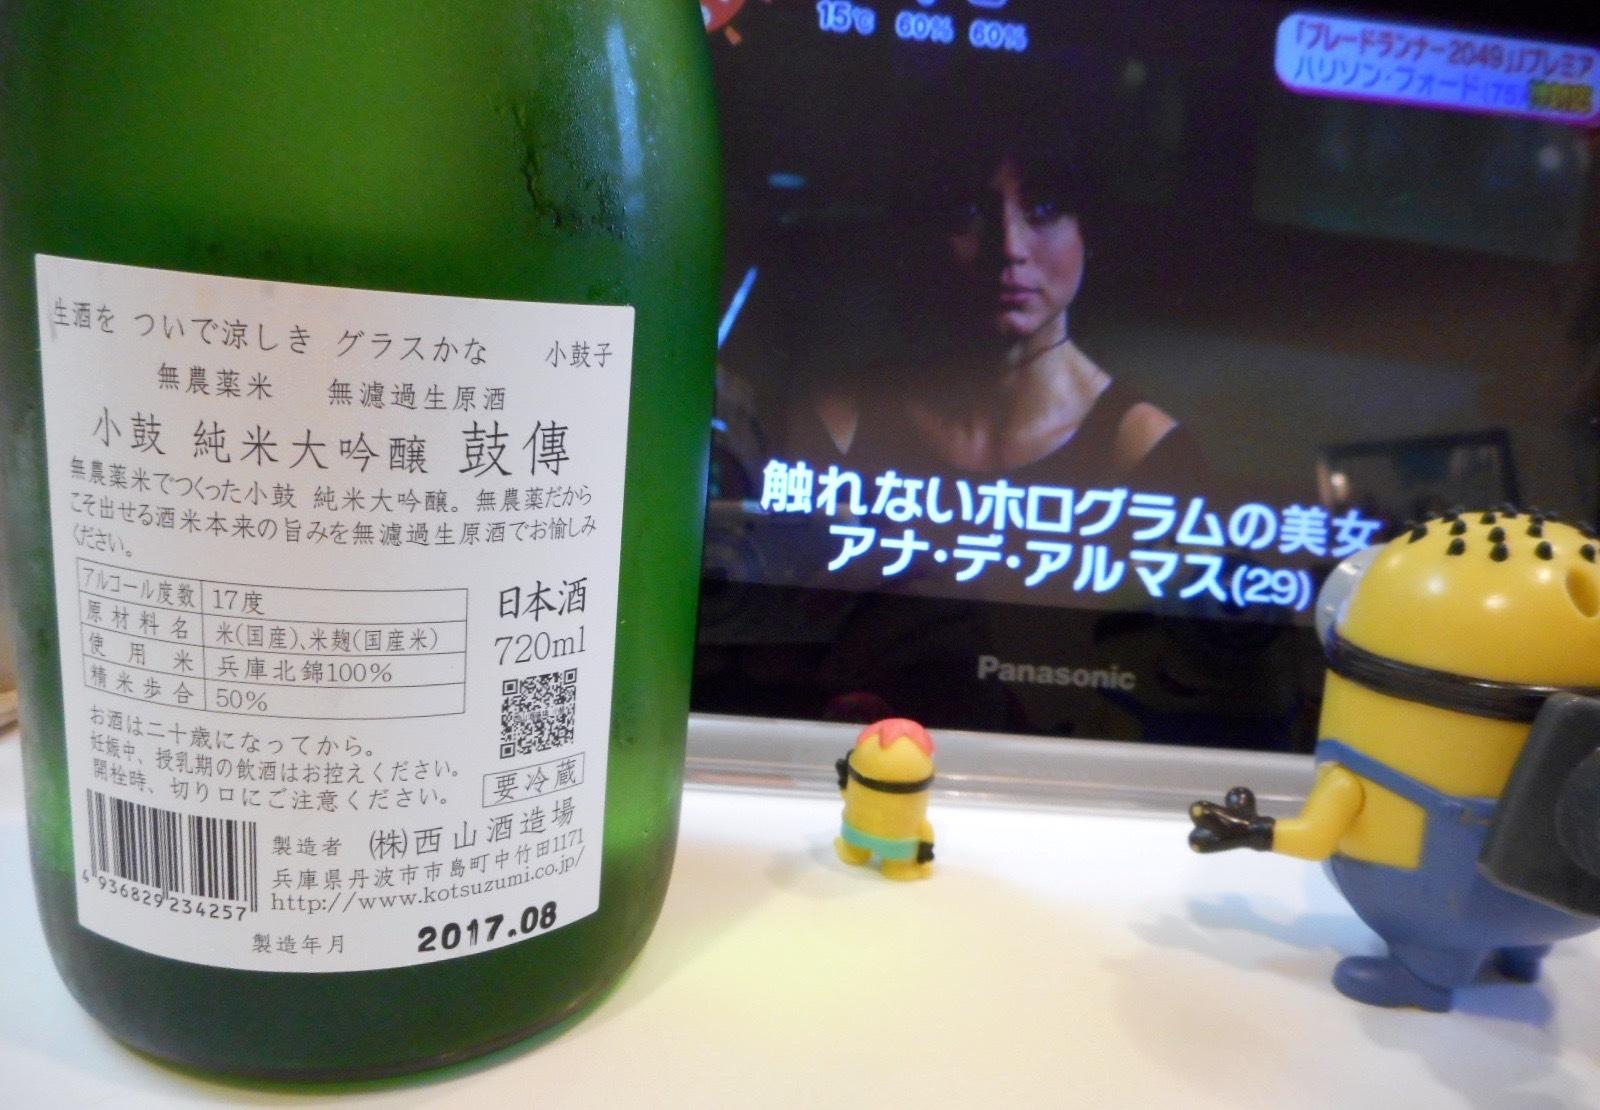 kozutsumi_koden28by2.jpg